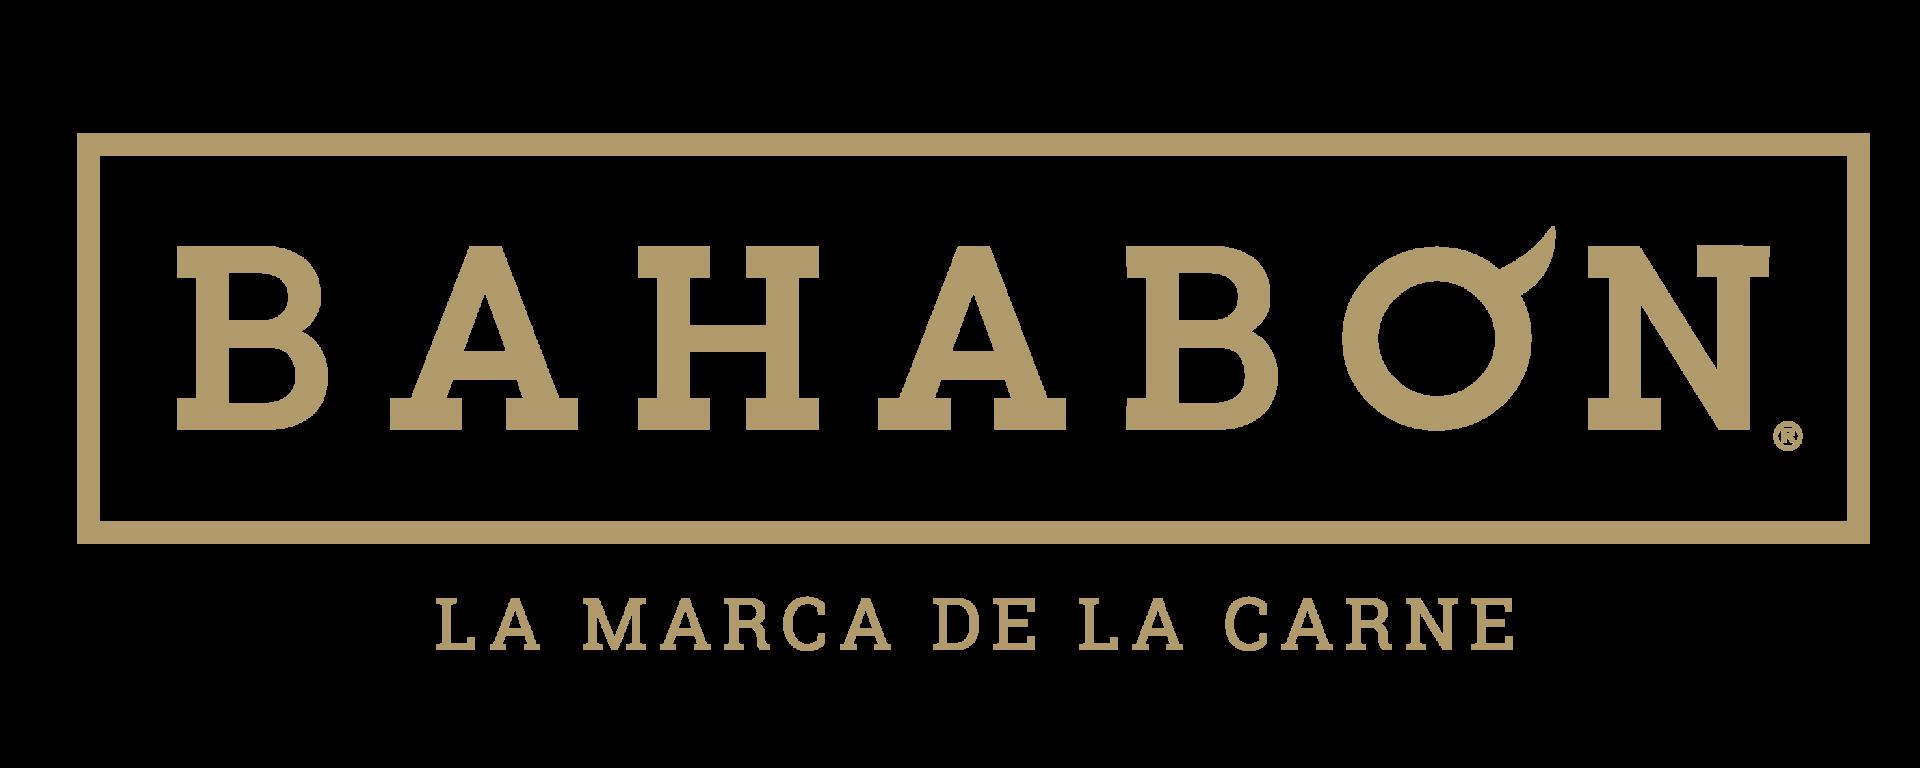 logo principal BAHABON[967] - Carnes Bahabon _ Grupo Kalmanar SL